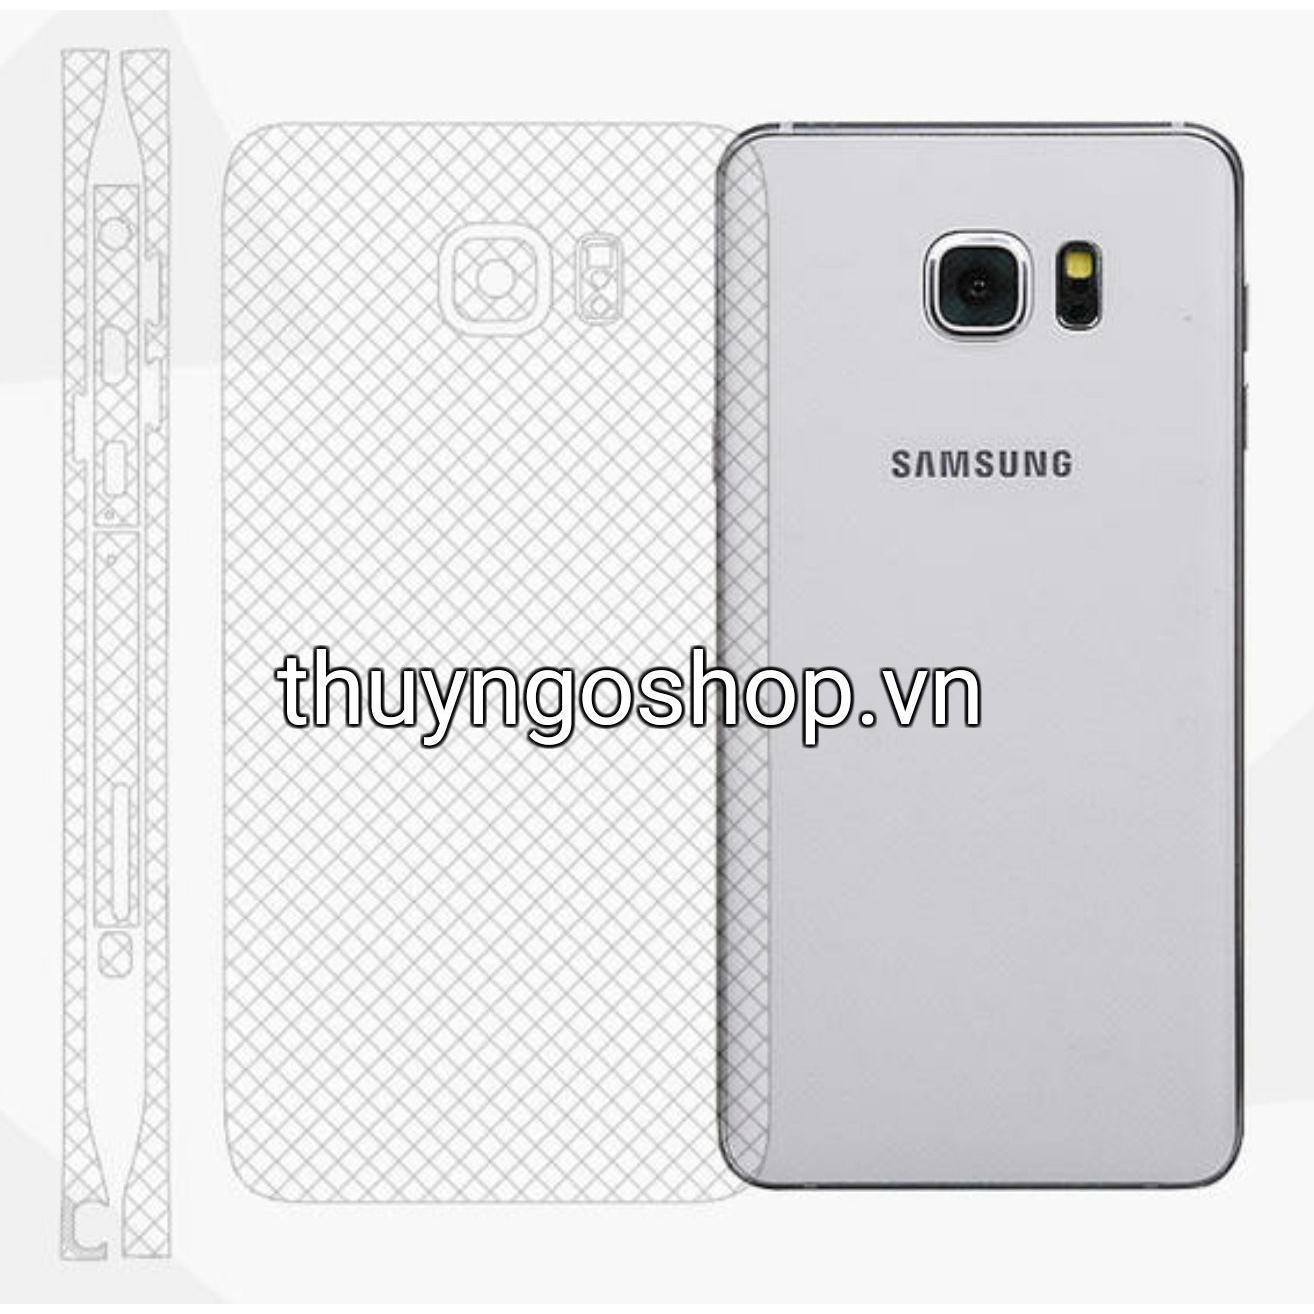 Bộ dán full body Samsung Galaxy S6 Egde plus